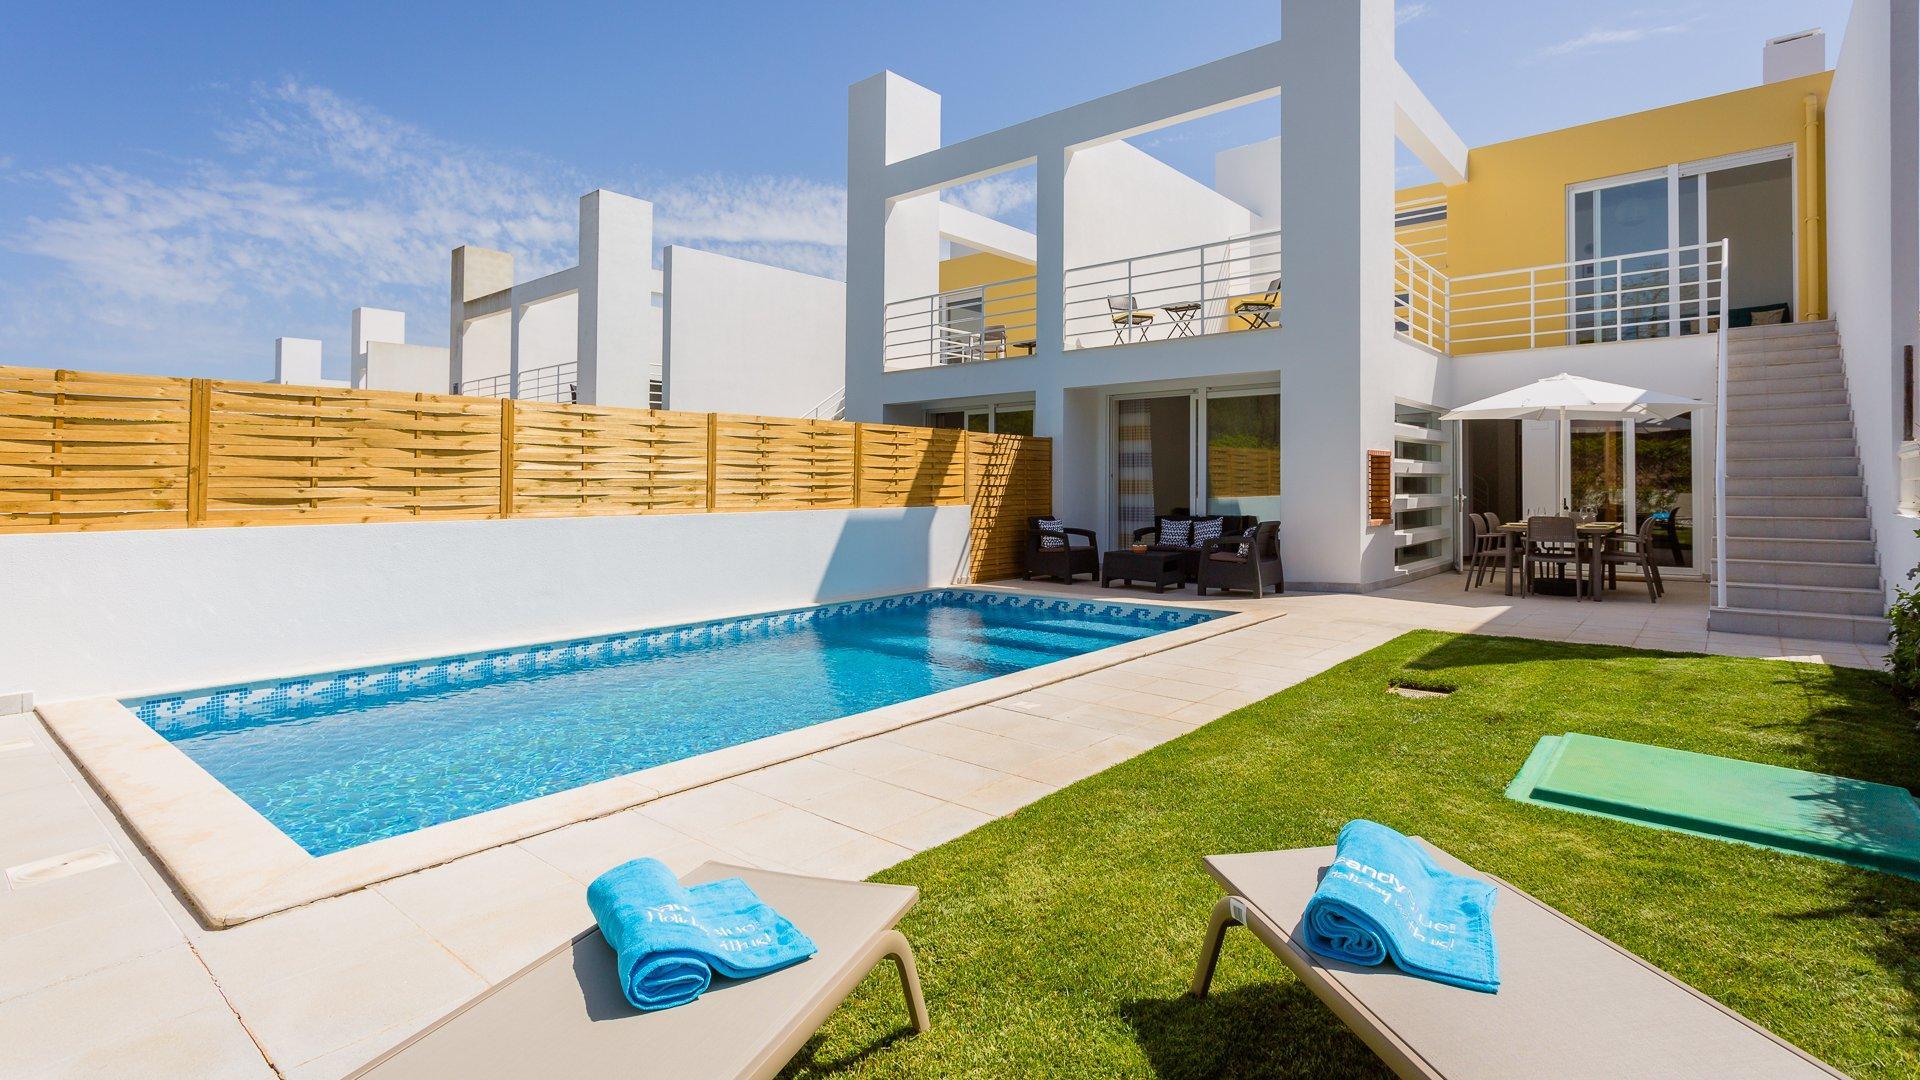 Villa Rosa - Varandas do Lago, Quinta do Lago, Algarve - SB_Varandas_Lago_19-23.jpg